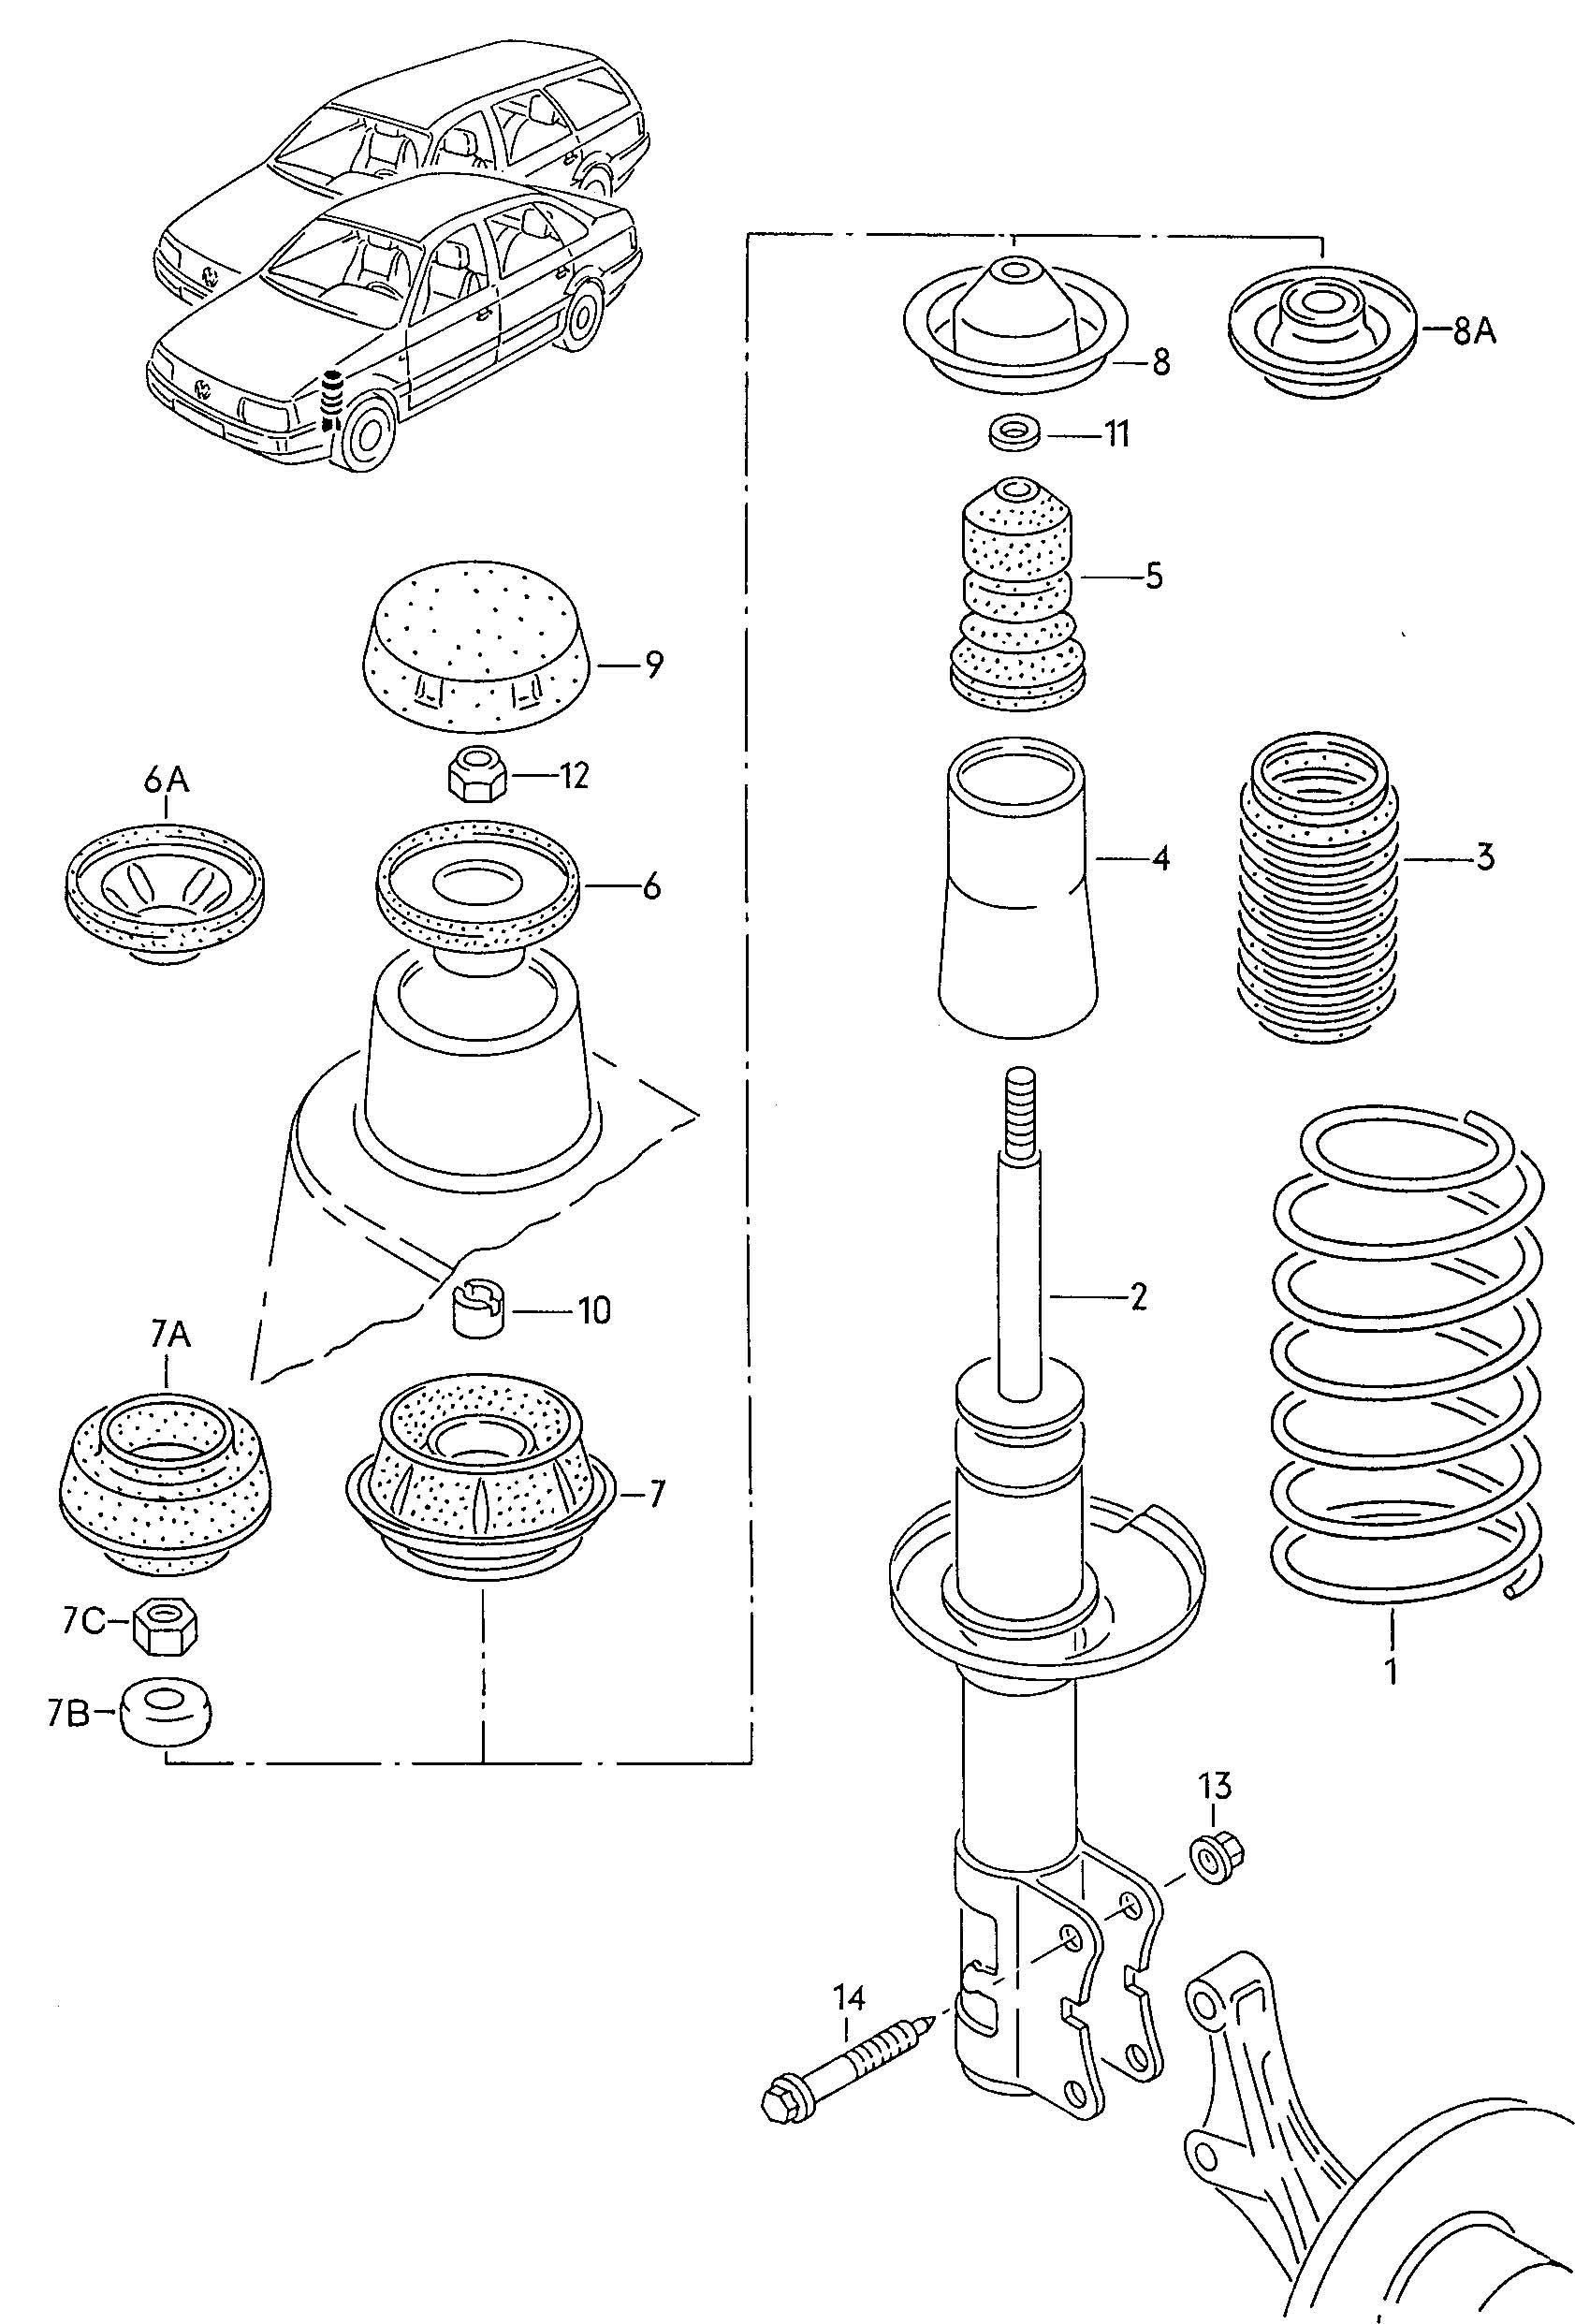 Toyota Headlight Upgrade Wiring Harness. Toyota. Auto